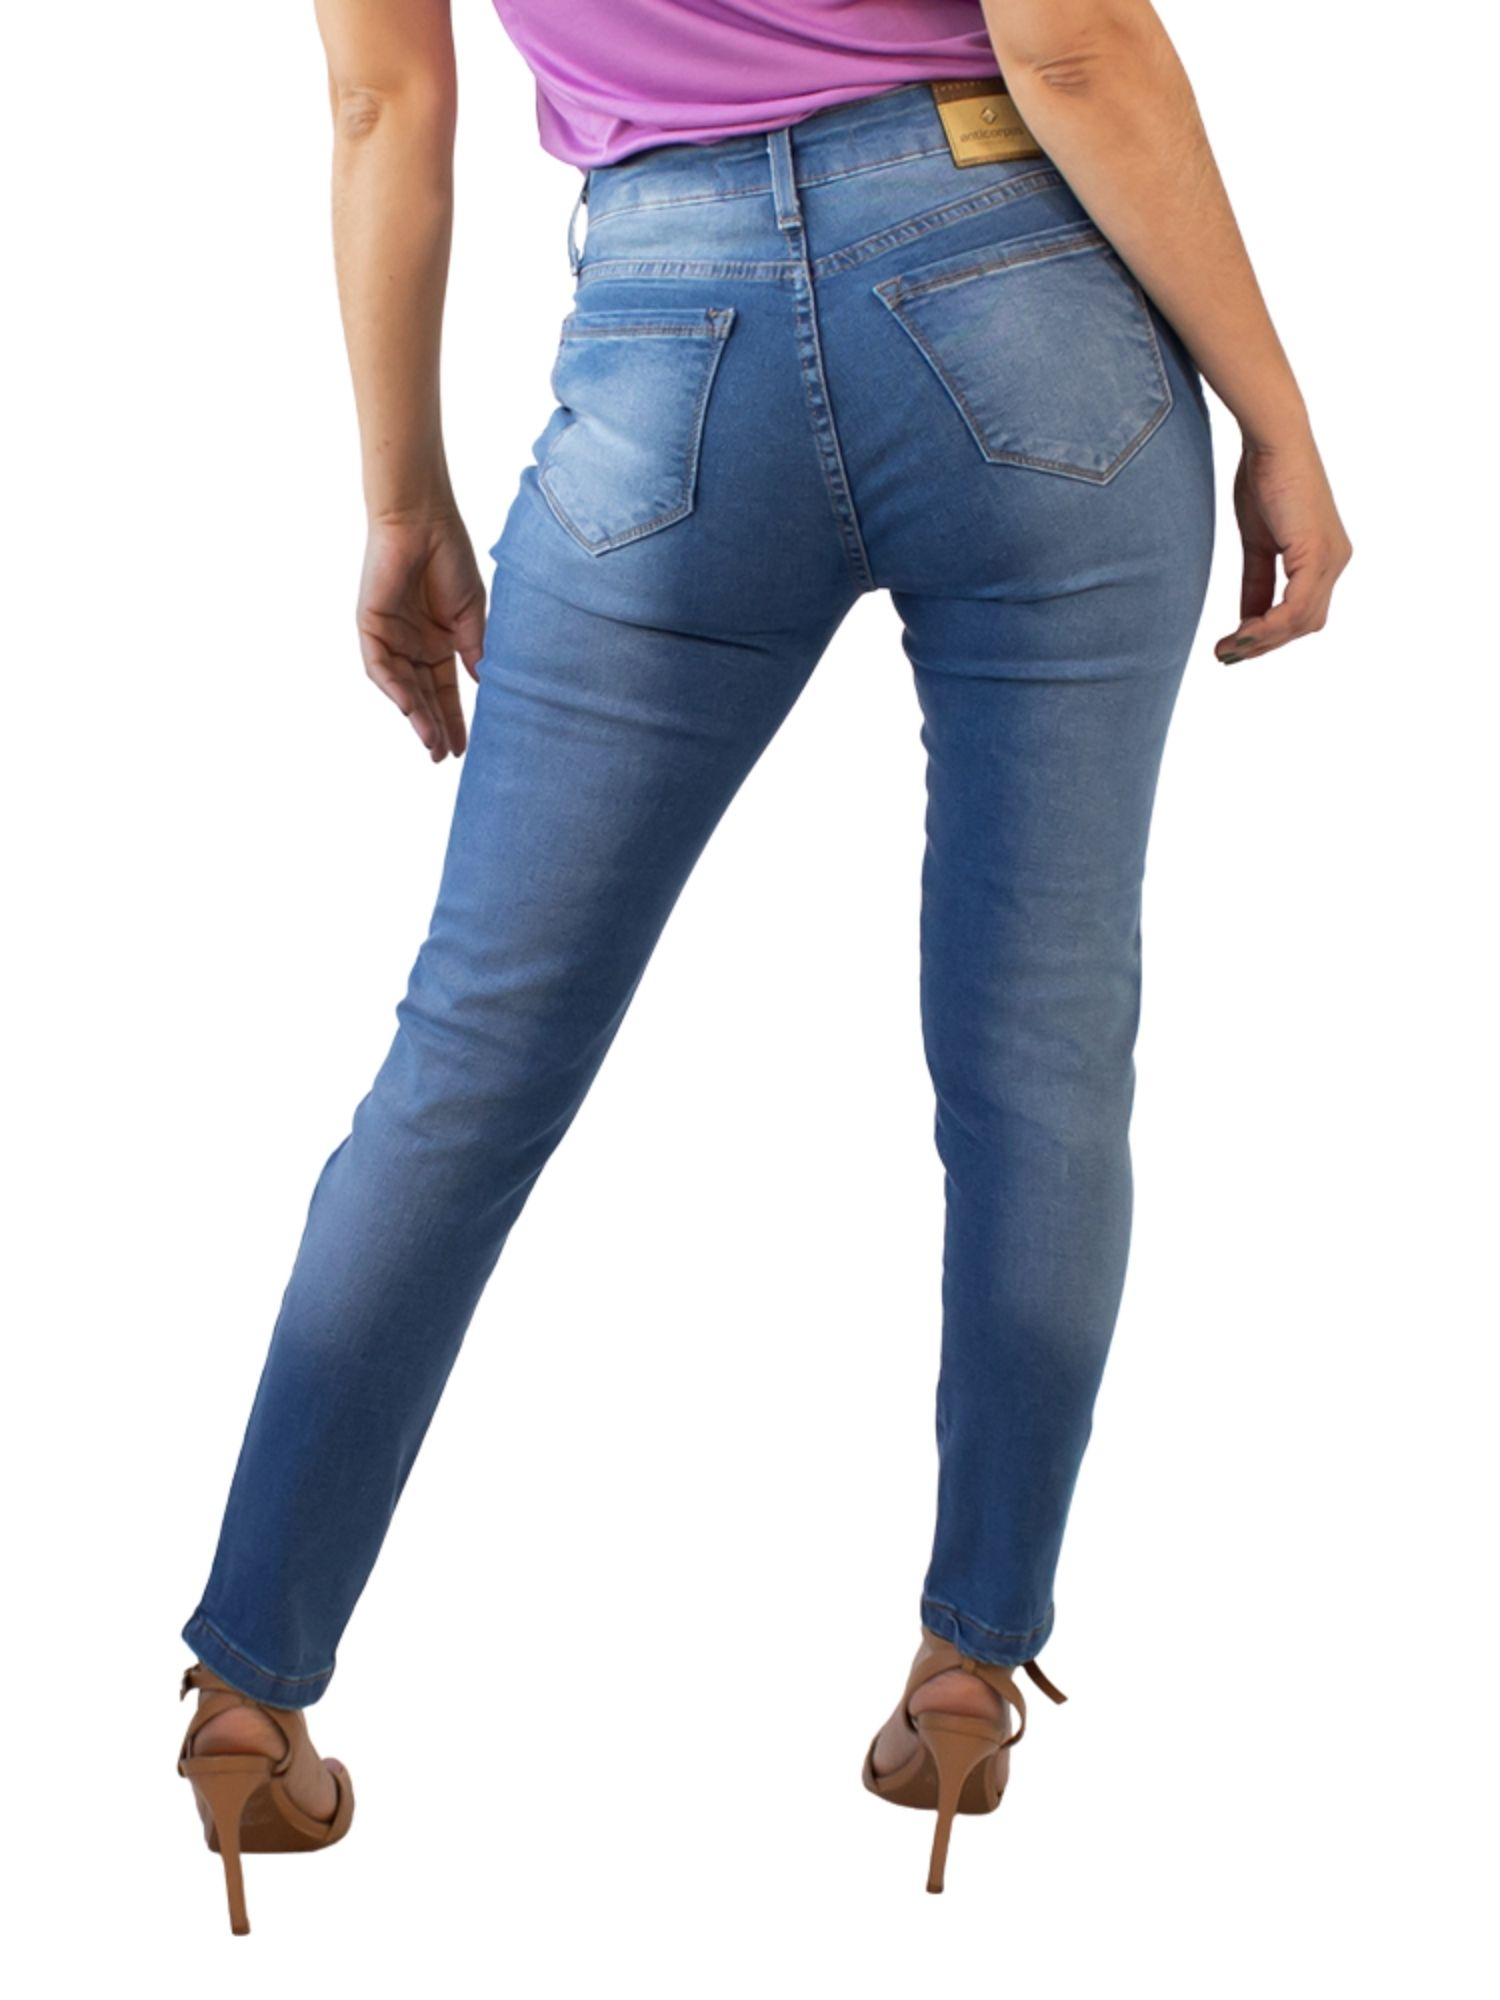 Calça Feminina Skinny Rasgada Cintura Alta Anticorpus  13494